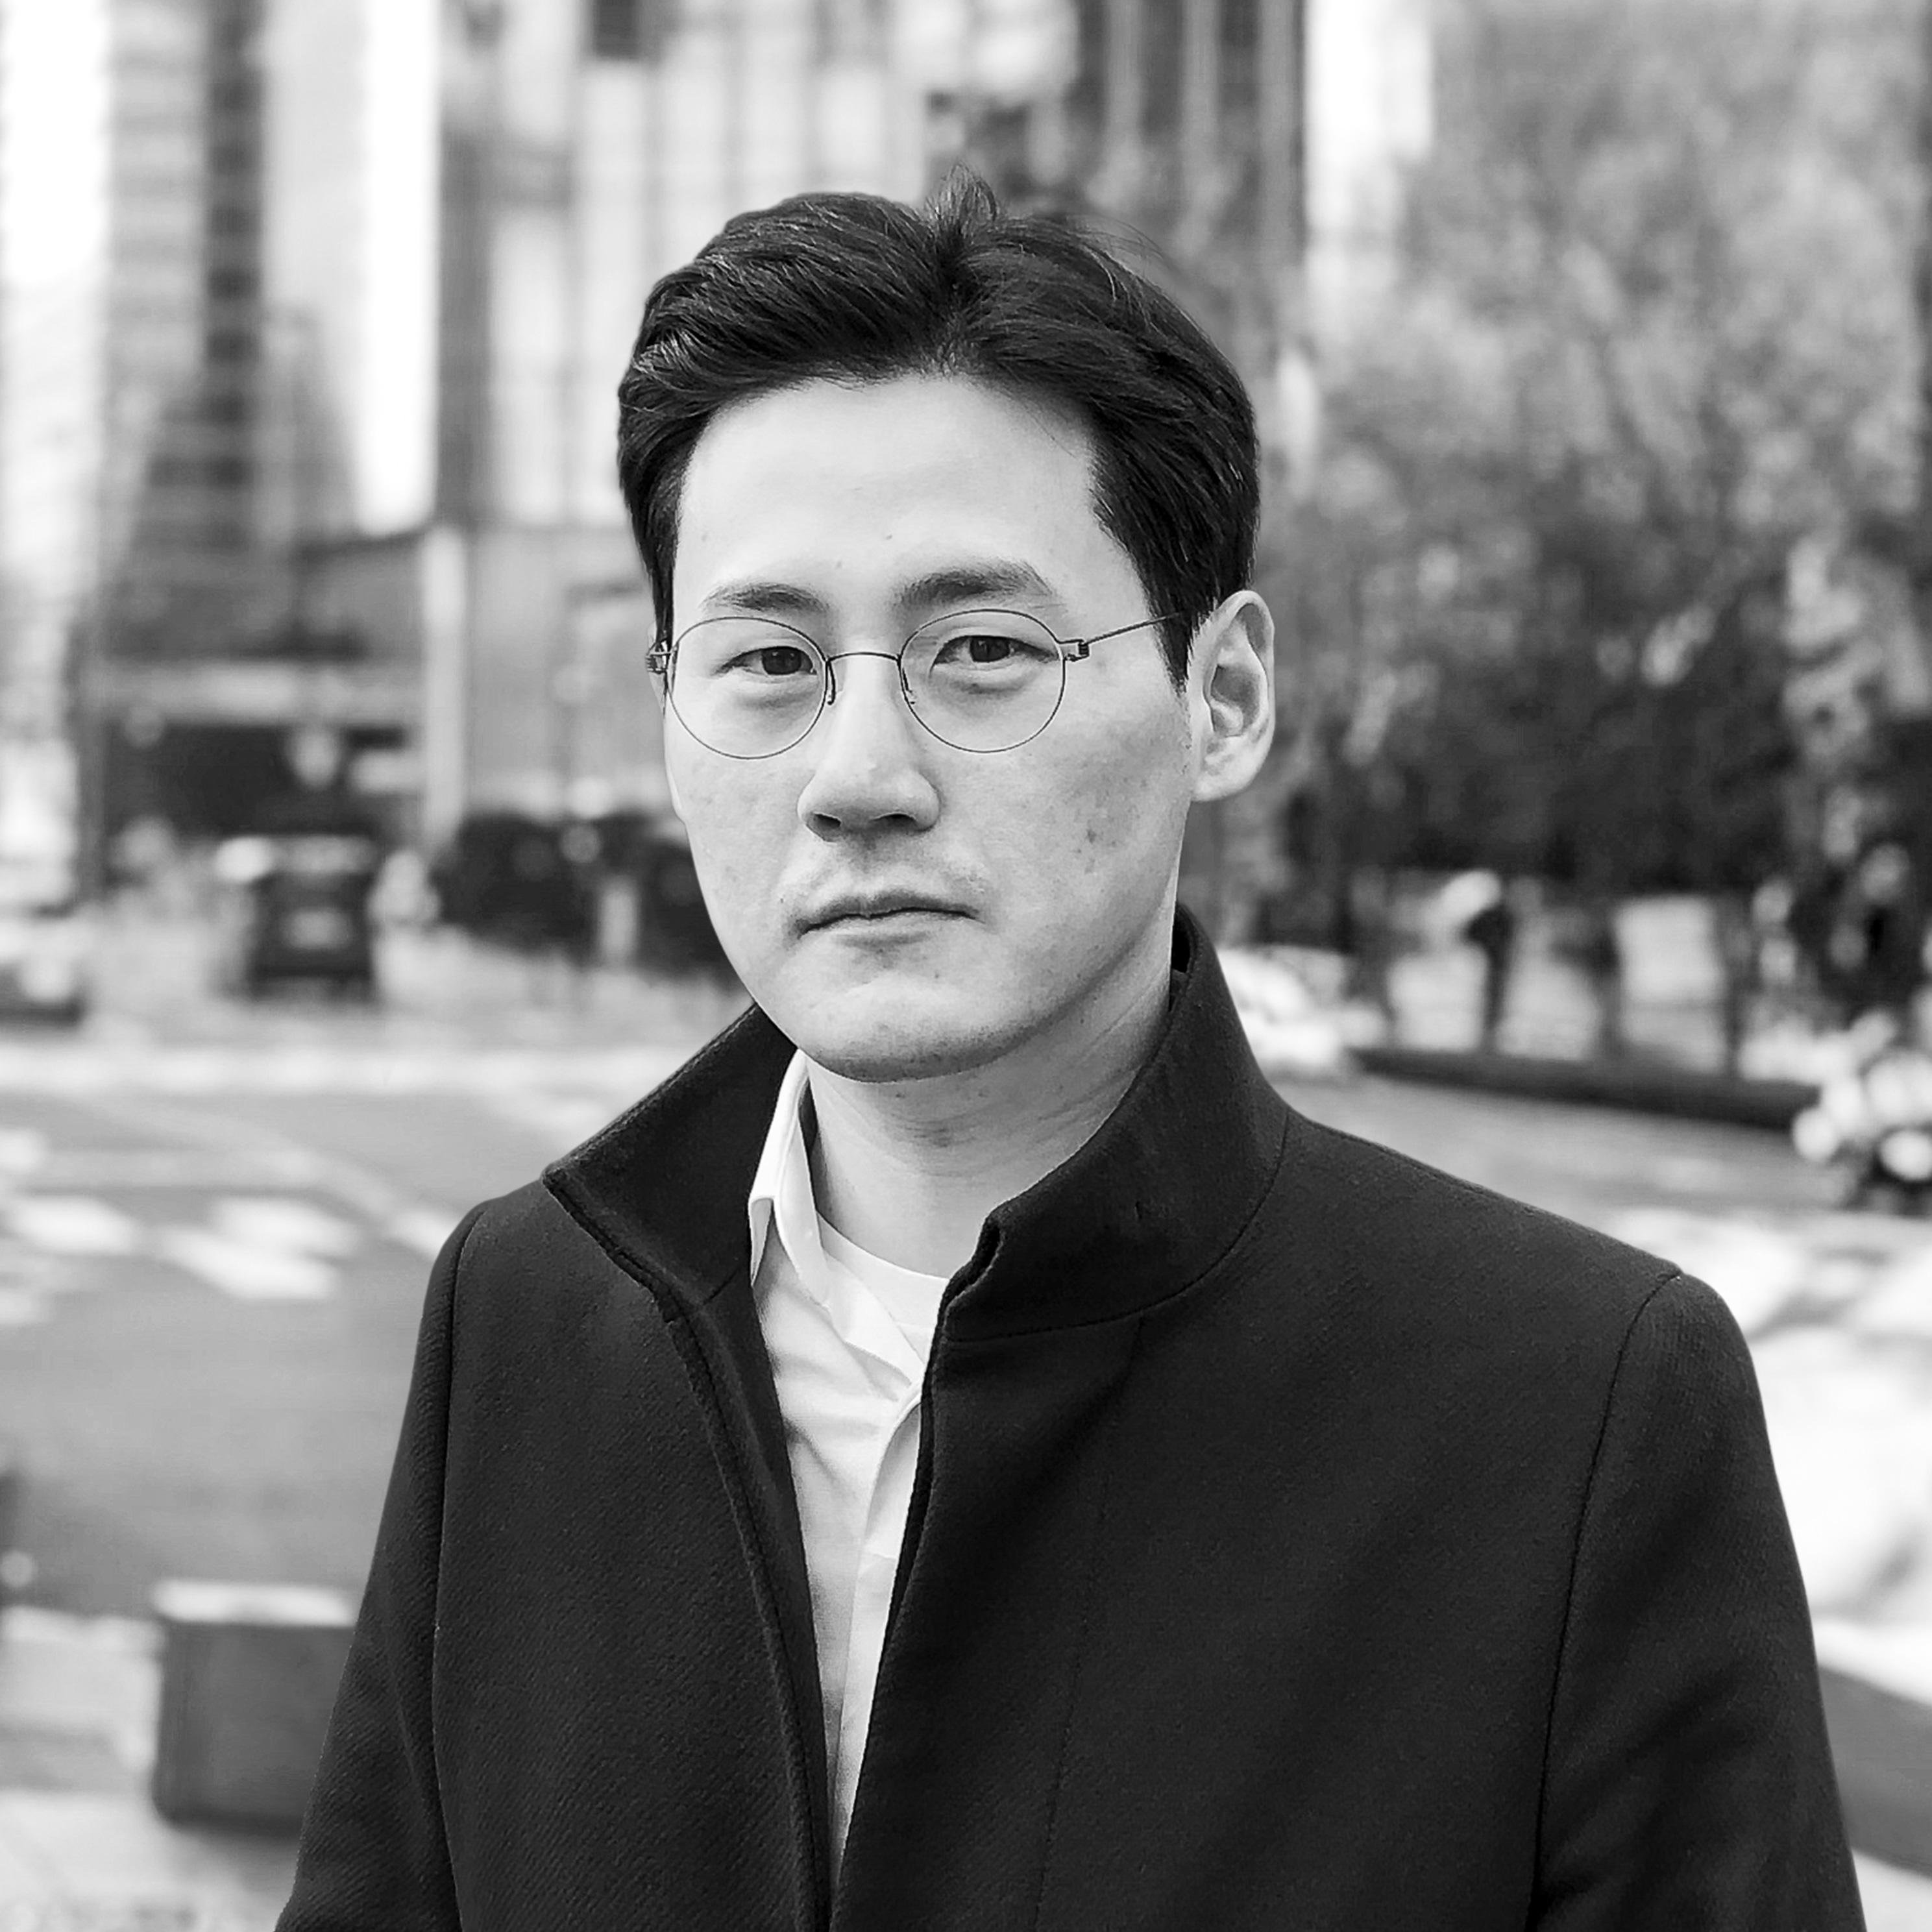 Kyoungmo Kim